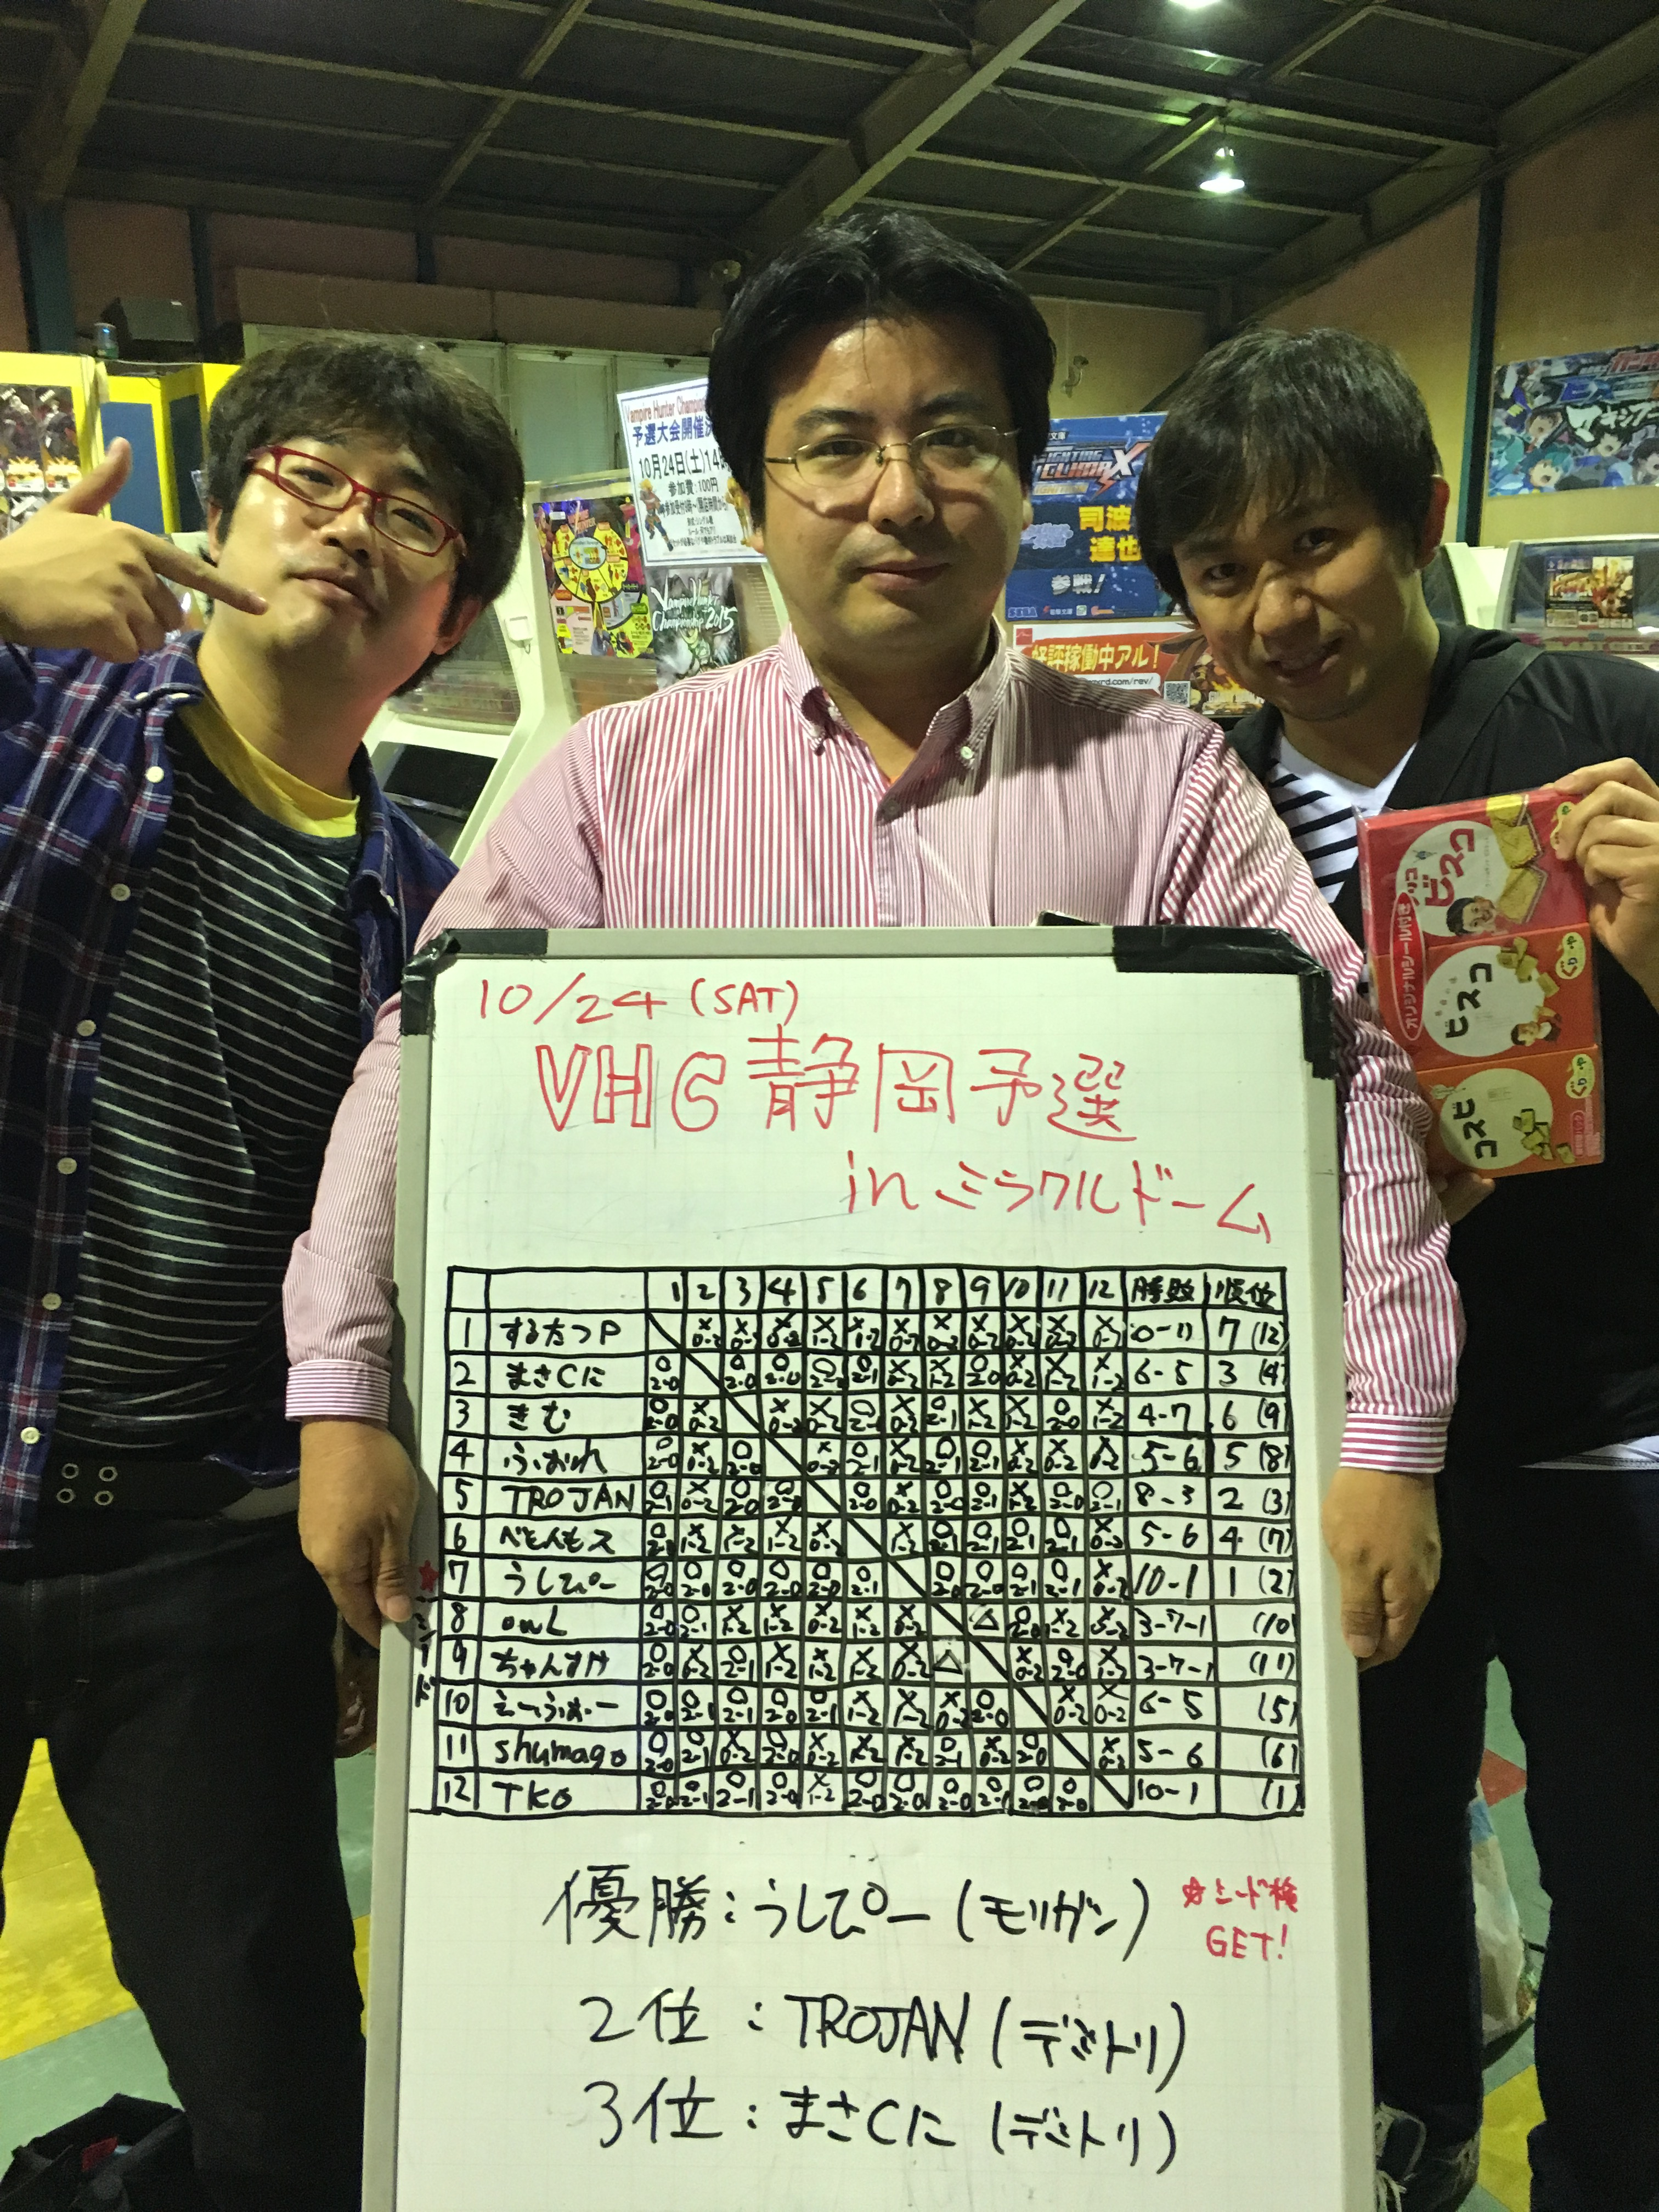 2015.10.24VHC静岡予選